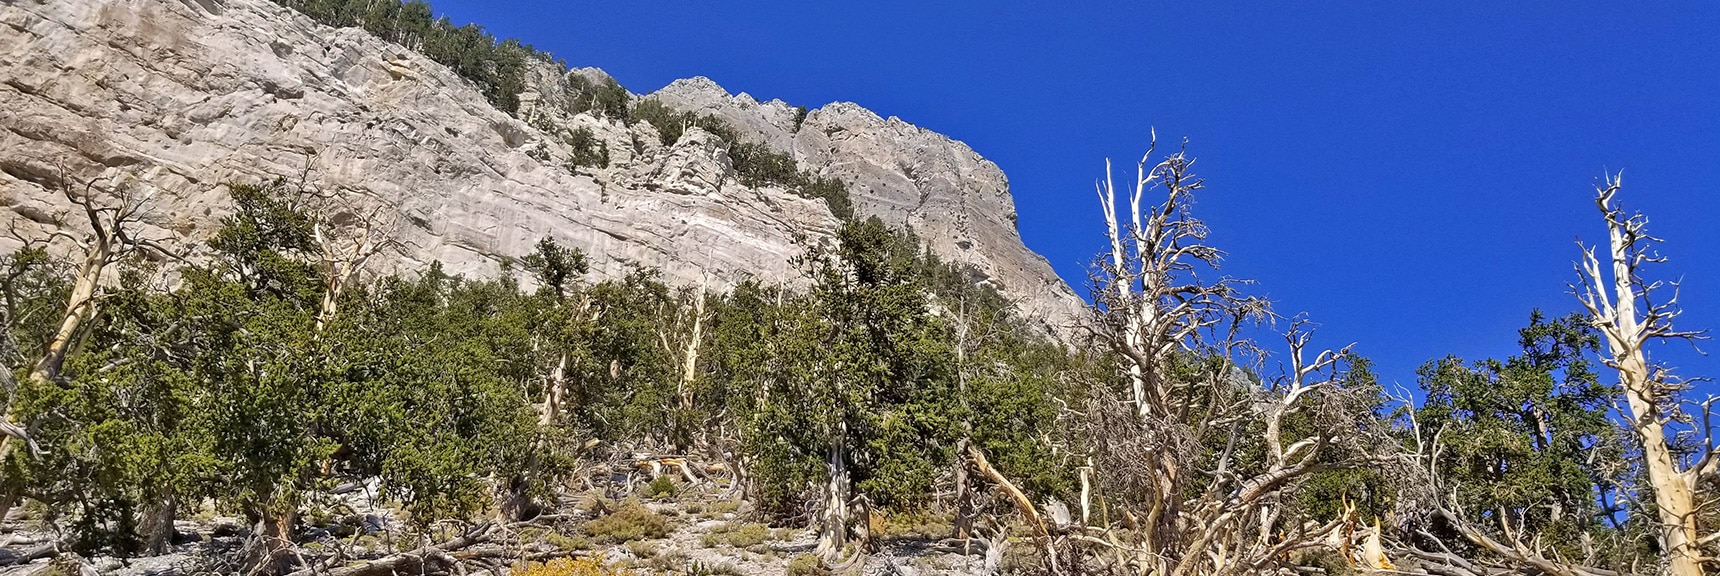 Approaching Mummy Mt. Head Cliffs   Mummy Mountain's Head, Mt Charleston Wilderness, Spring Mountains, Nevada 015